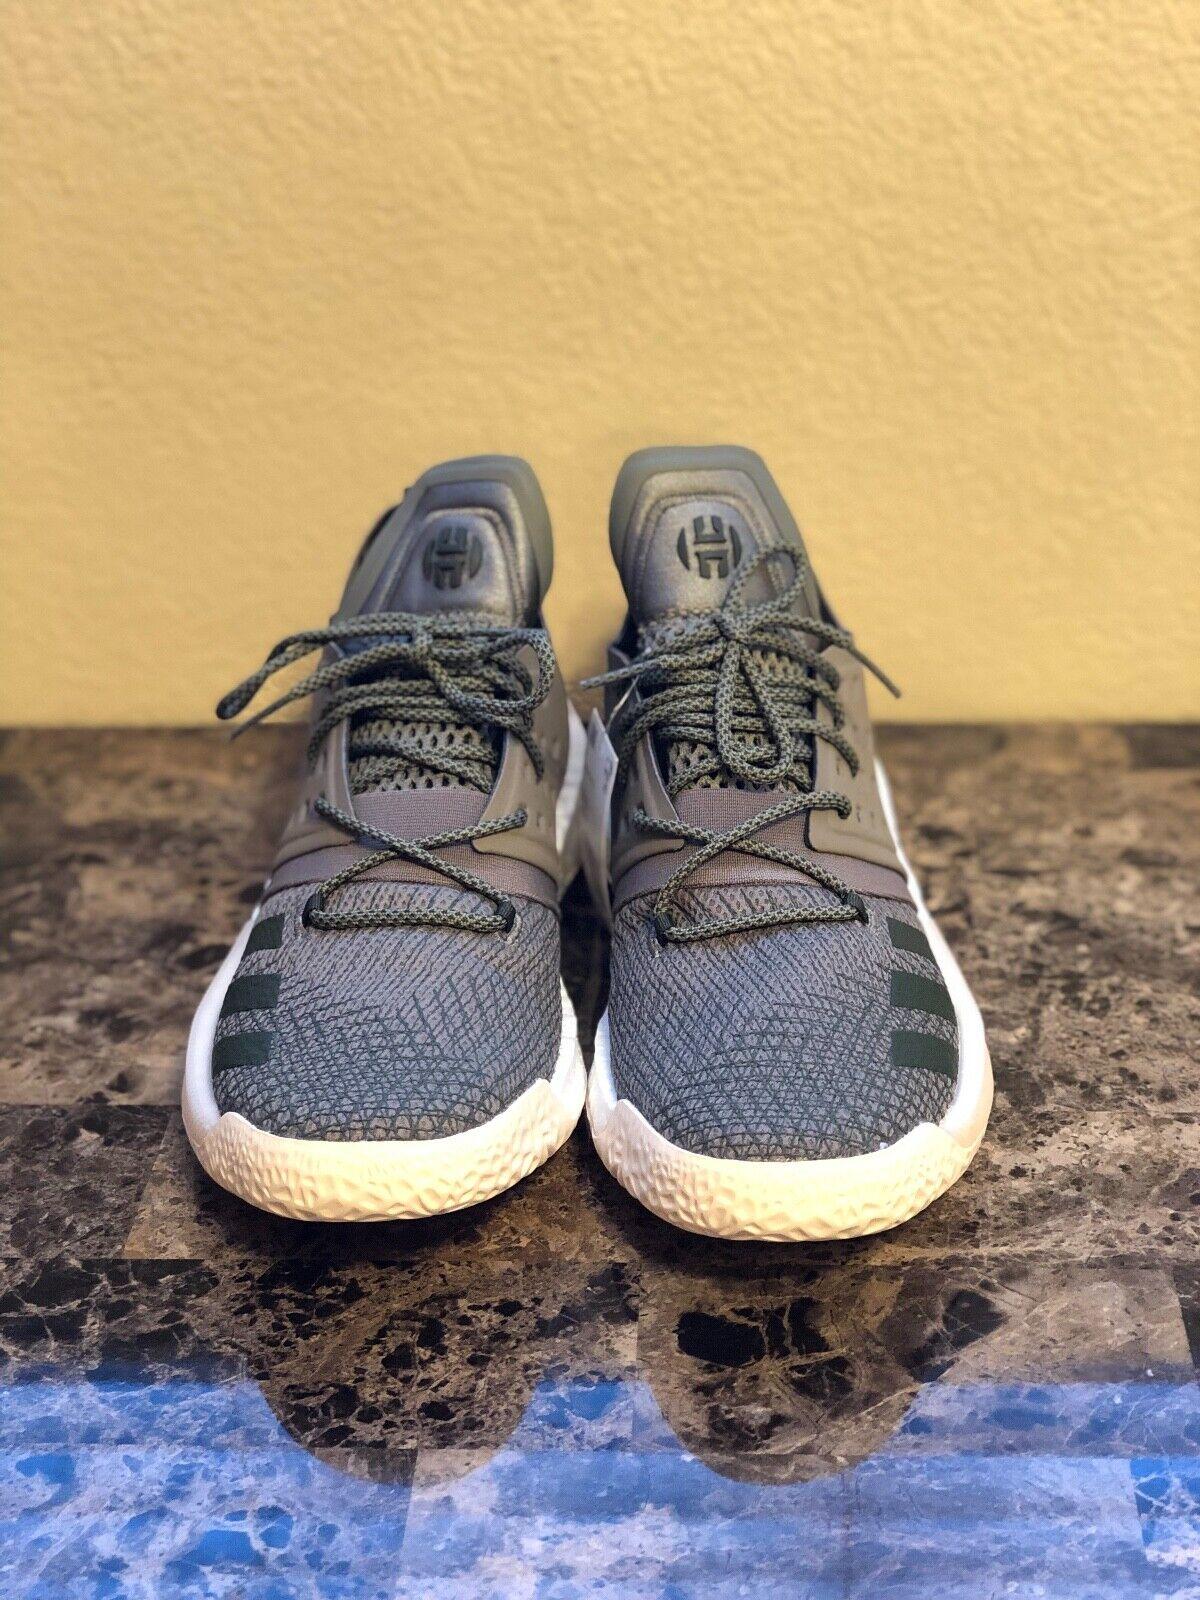 Adidas Harden Vol. 2 Basketball shoes Men's Size 12 AQ0027